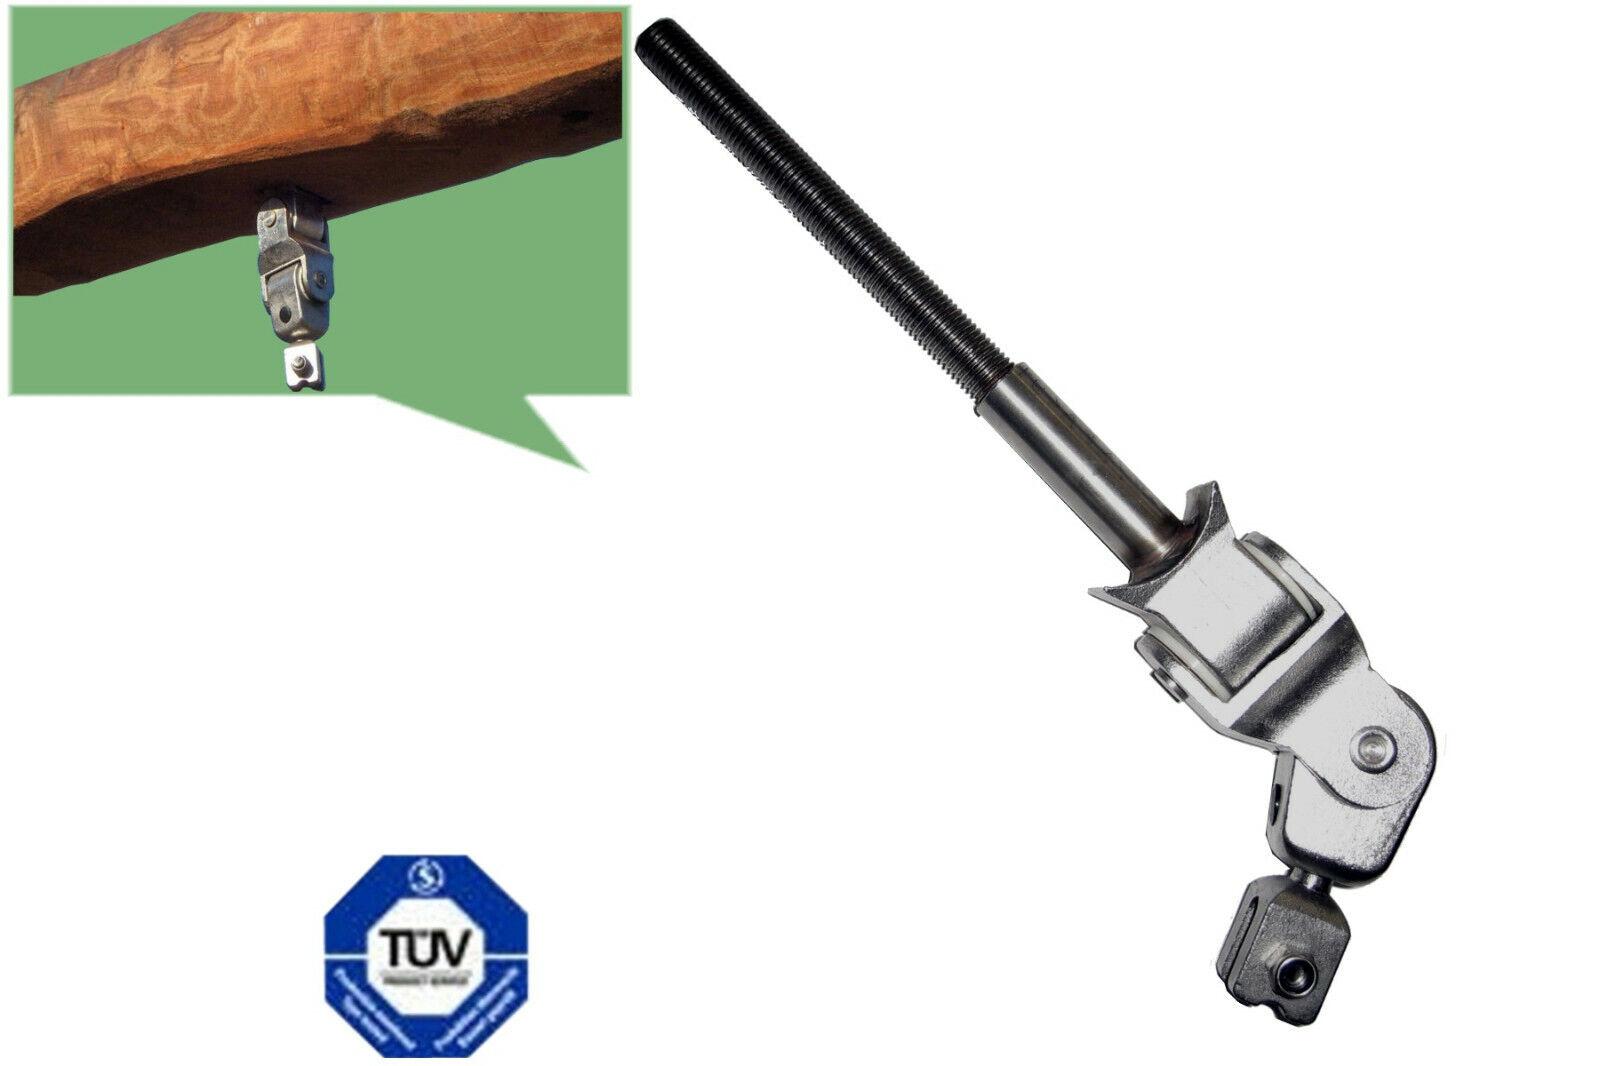 Swing Joint Cross Joint Voll-Edelstahl Swing Hooks Bolt 140mm M16 EN1176